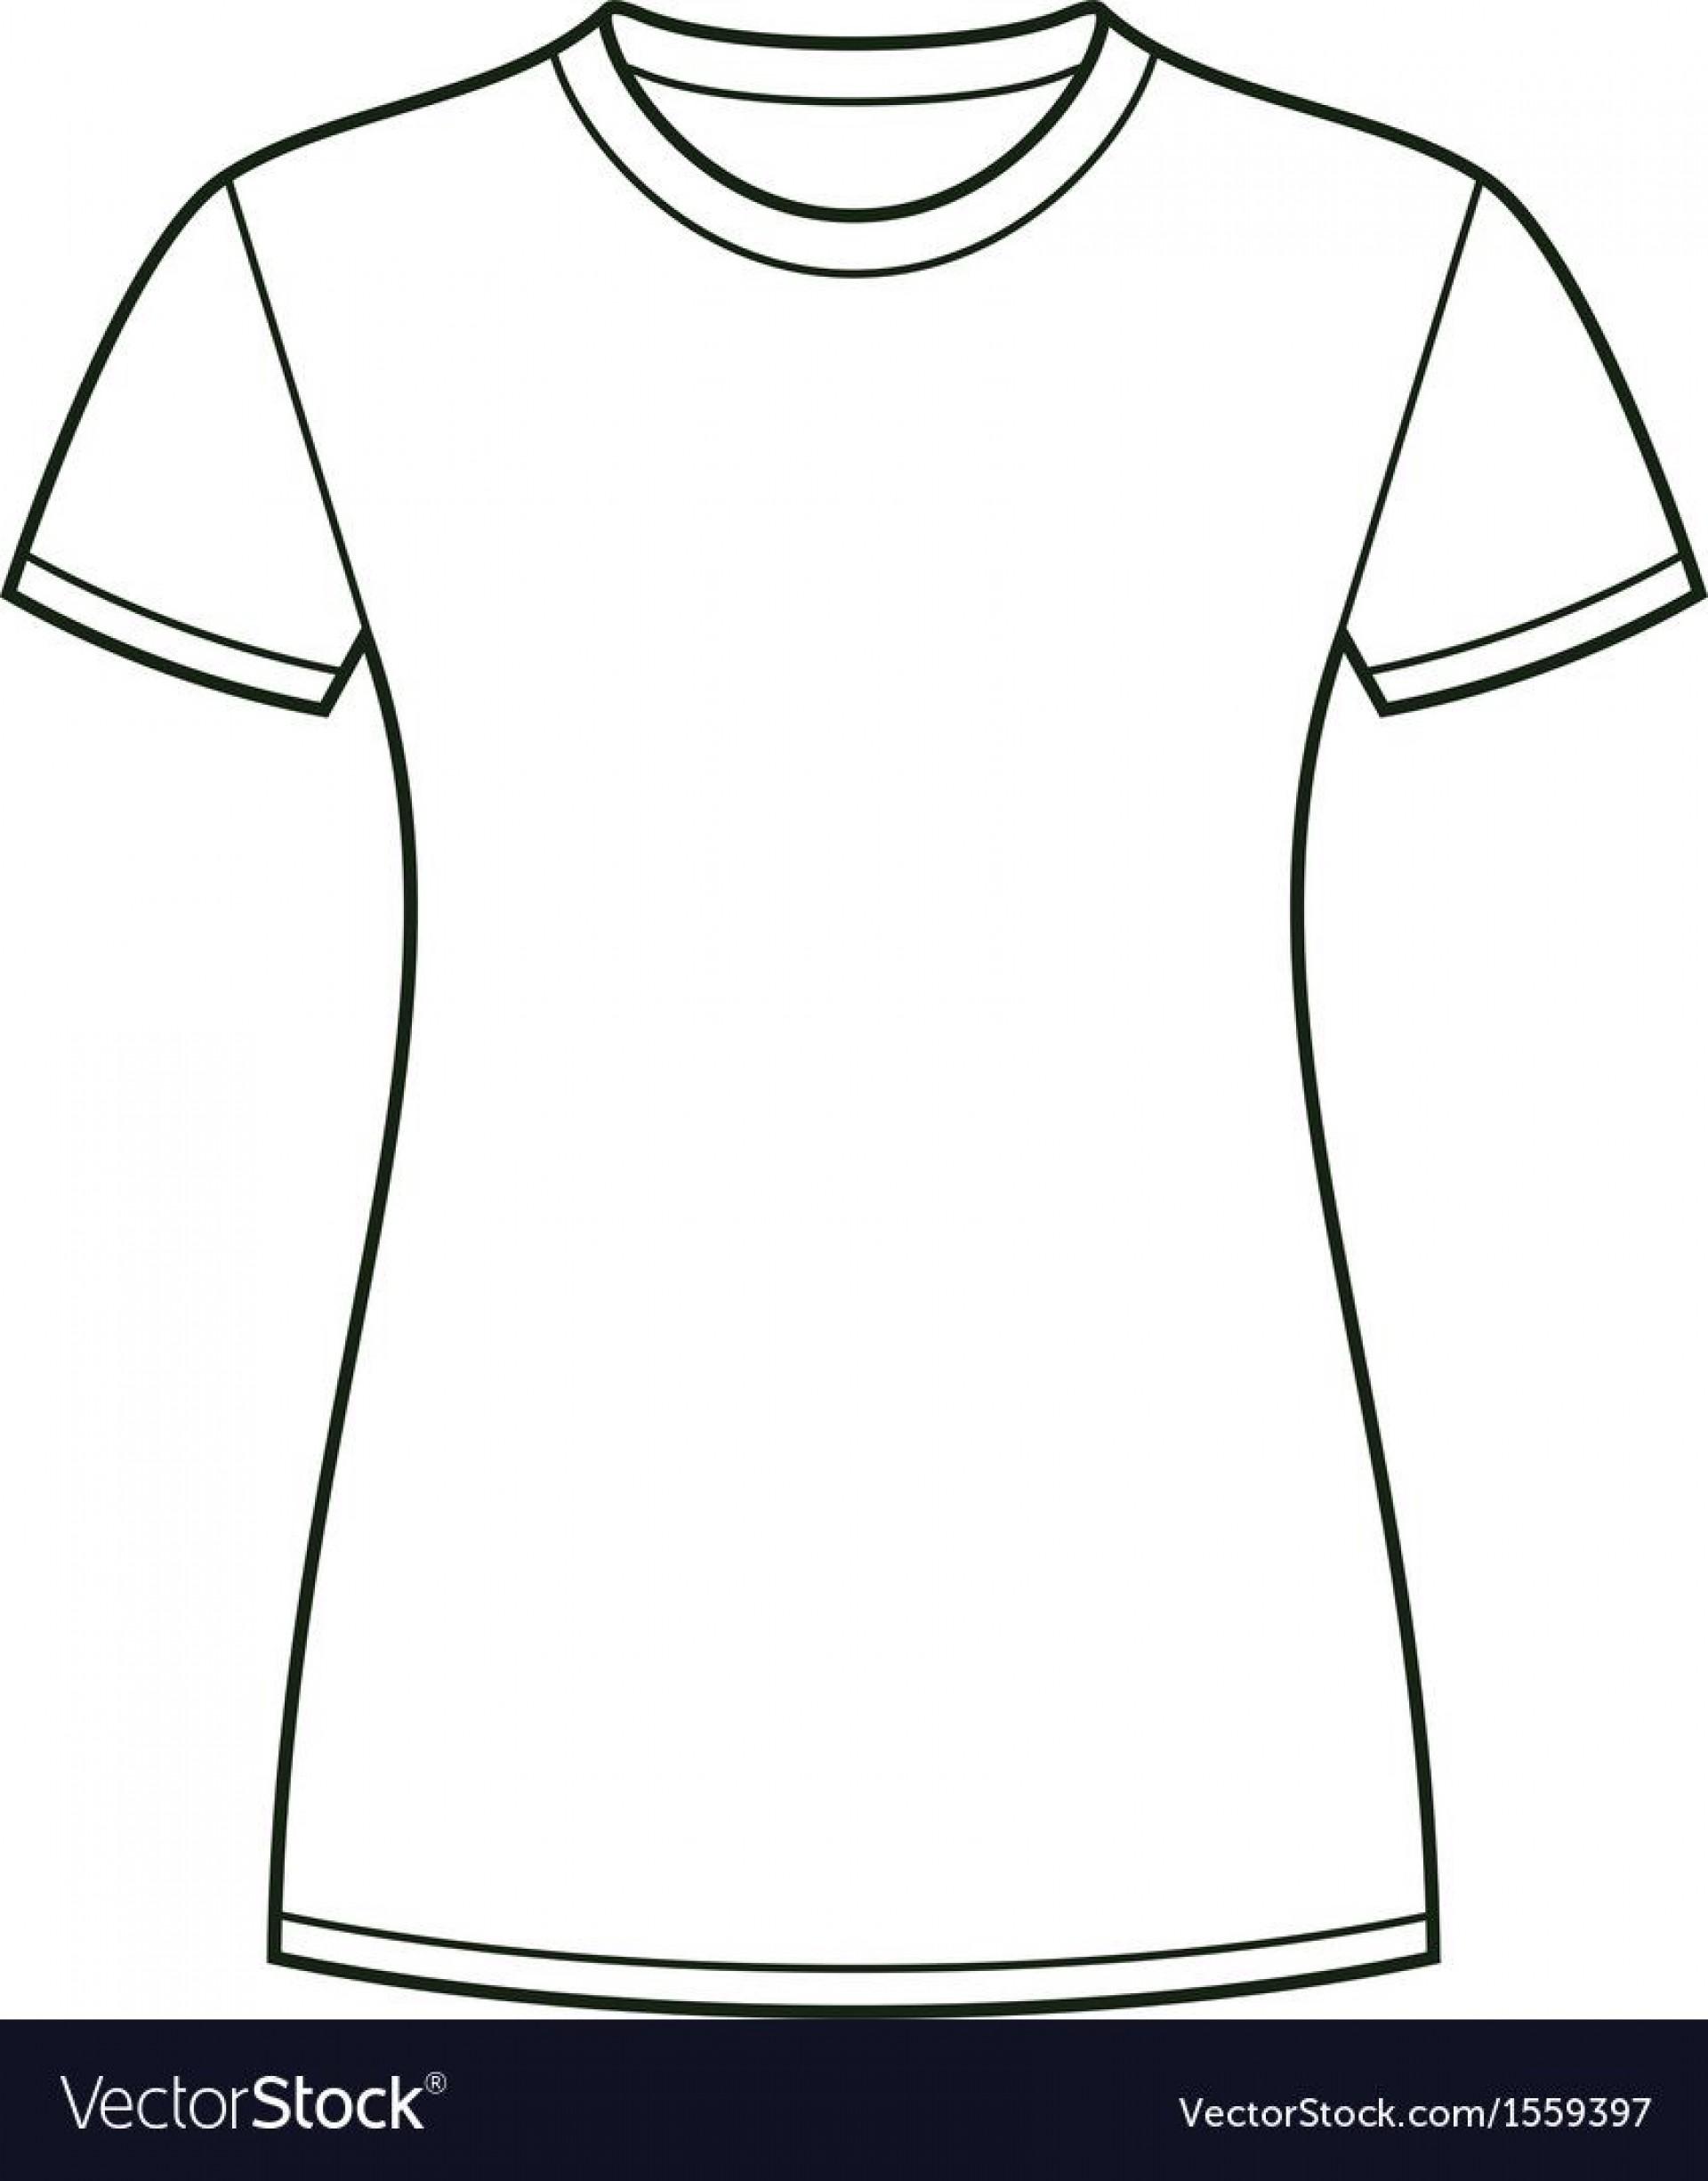 008 Impressive T Shirt Design Template Free Highest Quality  Psd Download1920